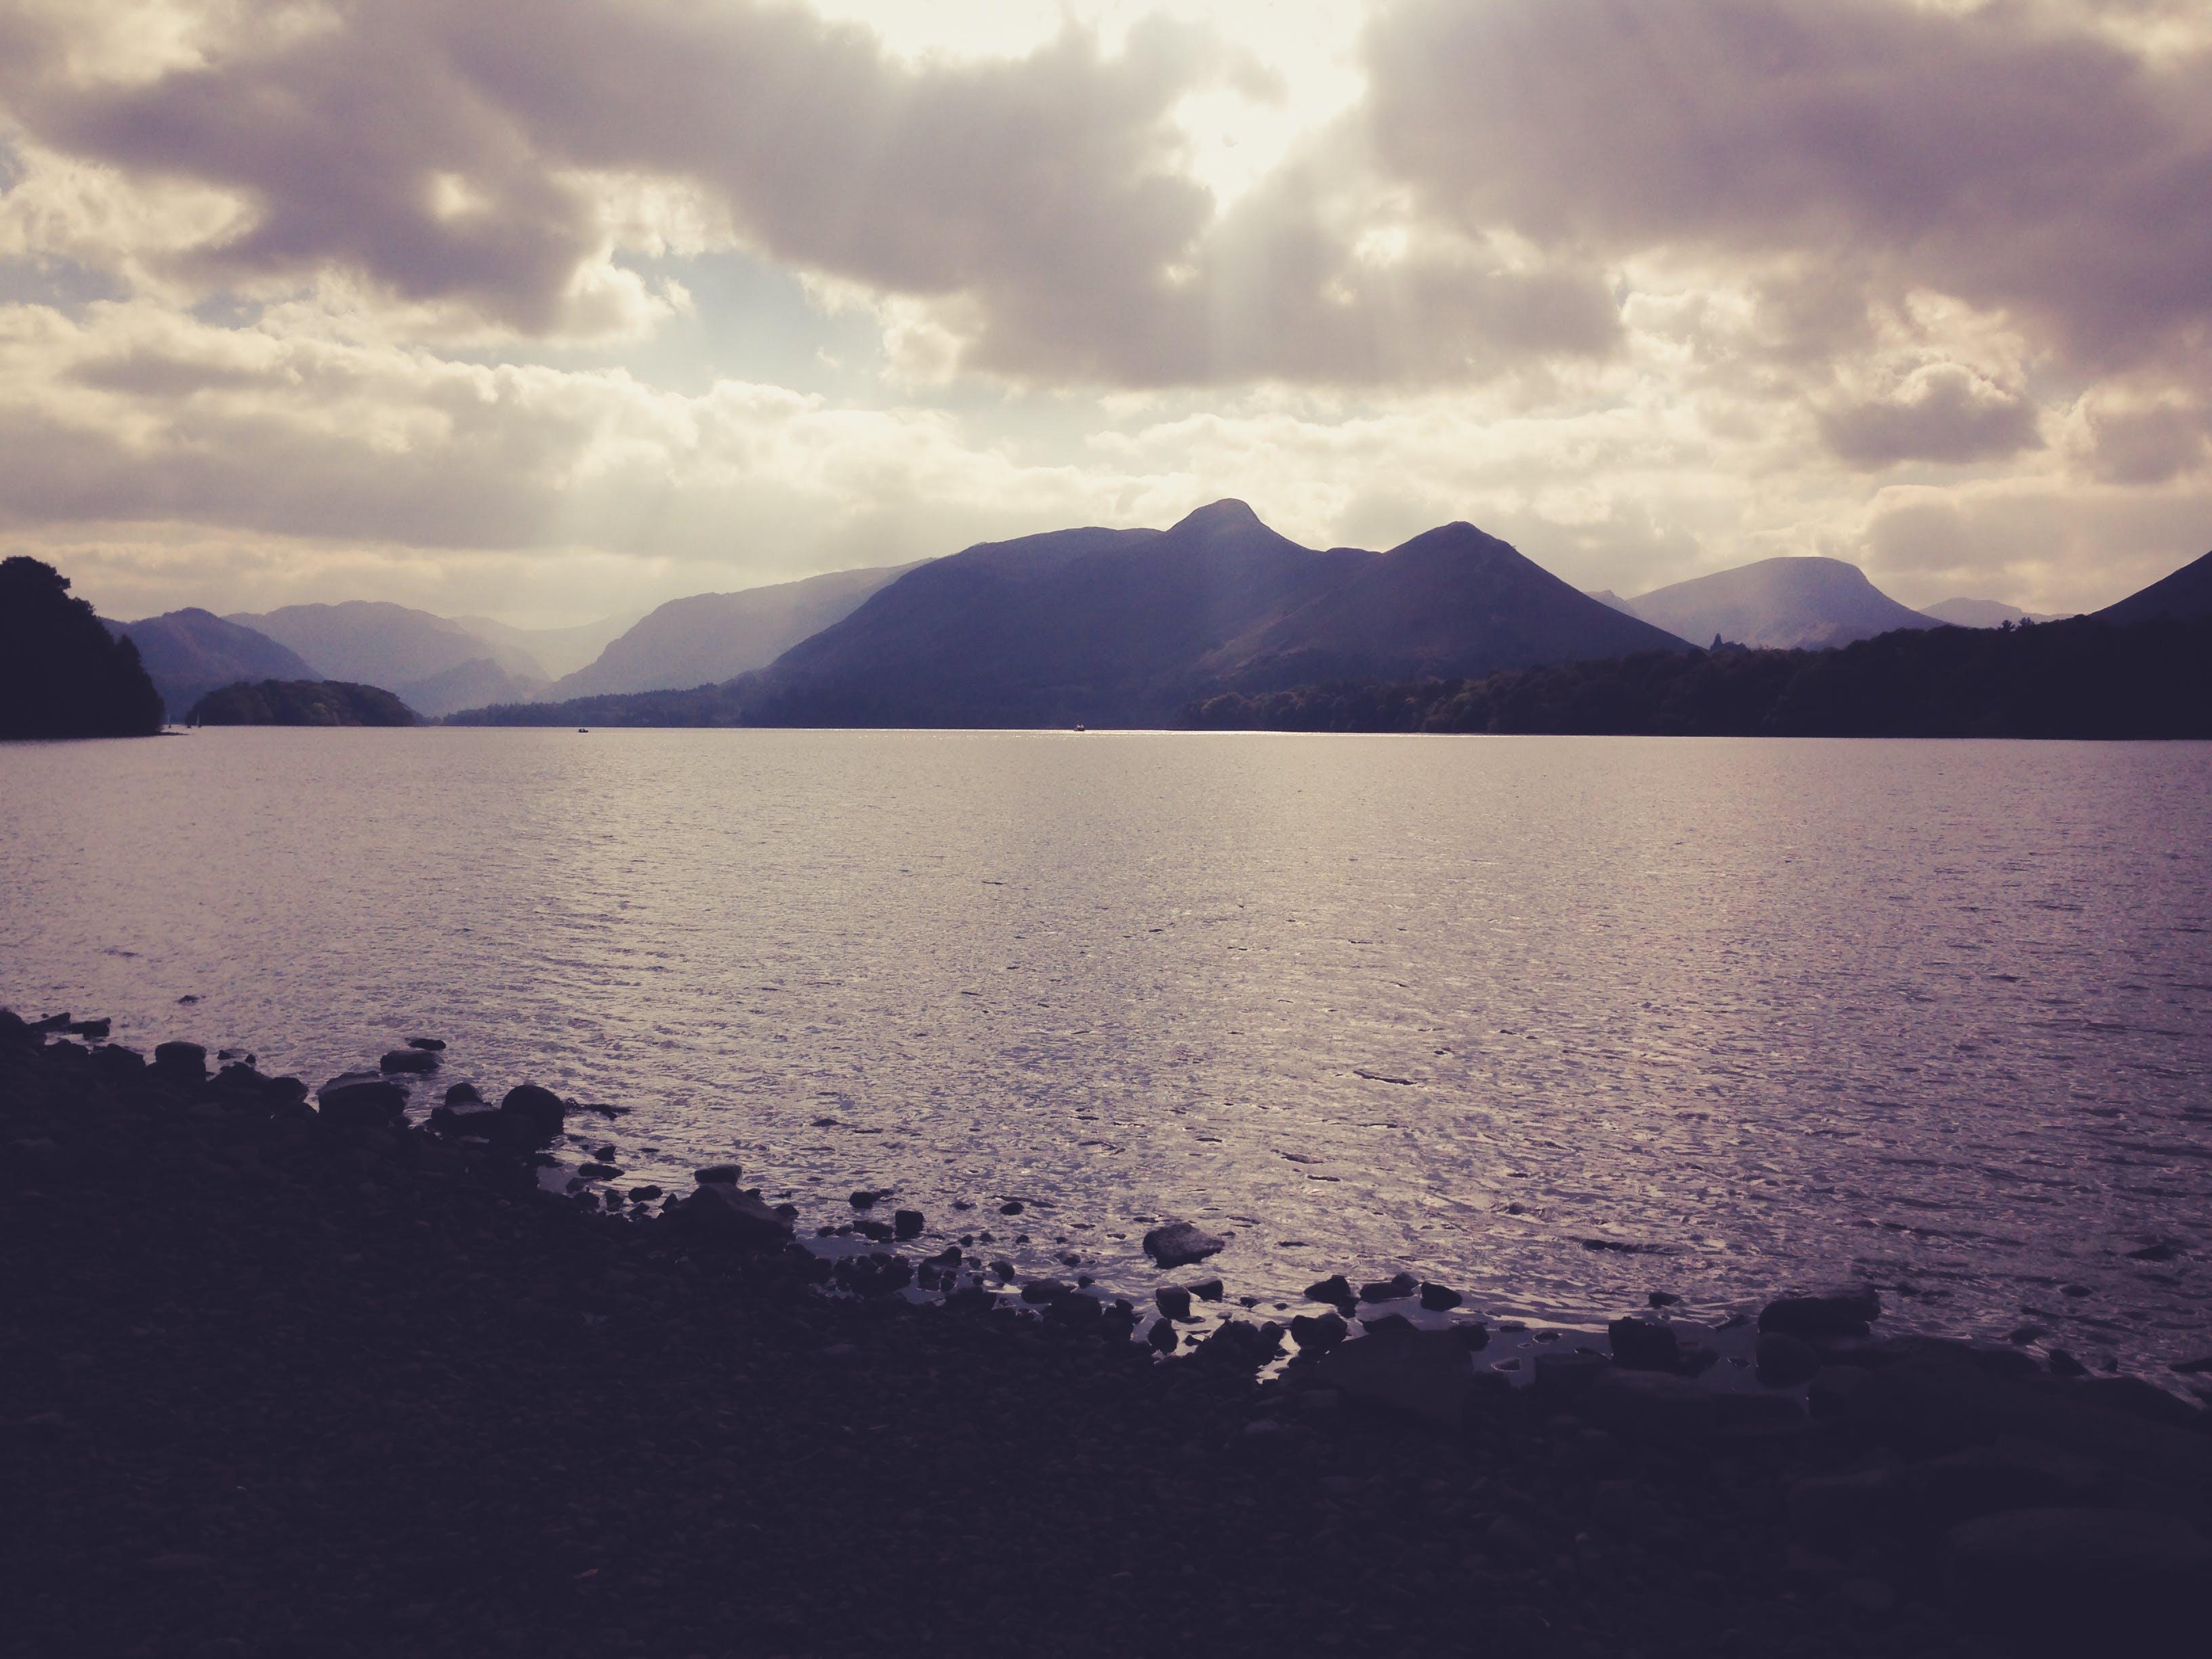 Free stock photo of nature, sunset, lake, peace